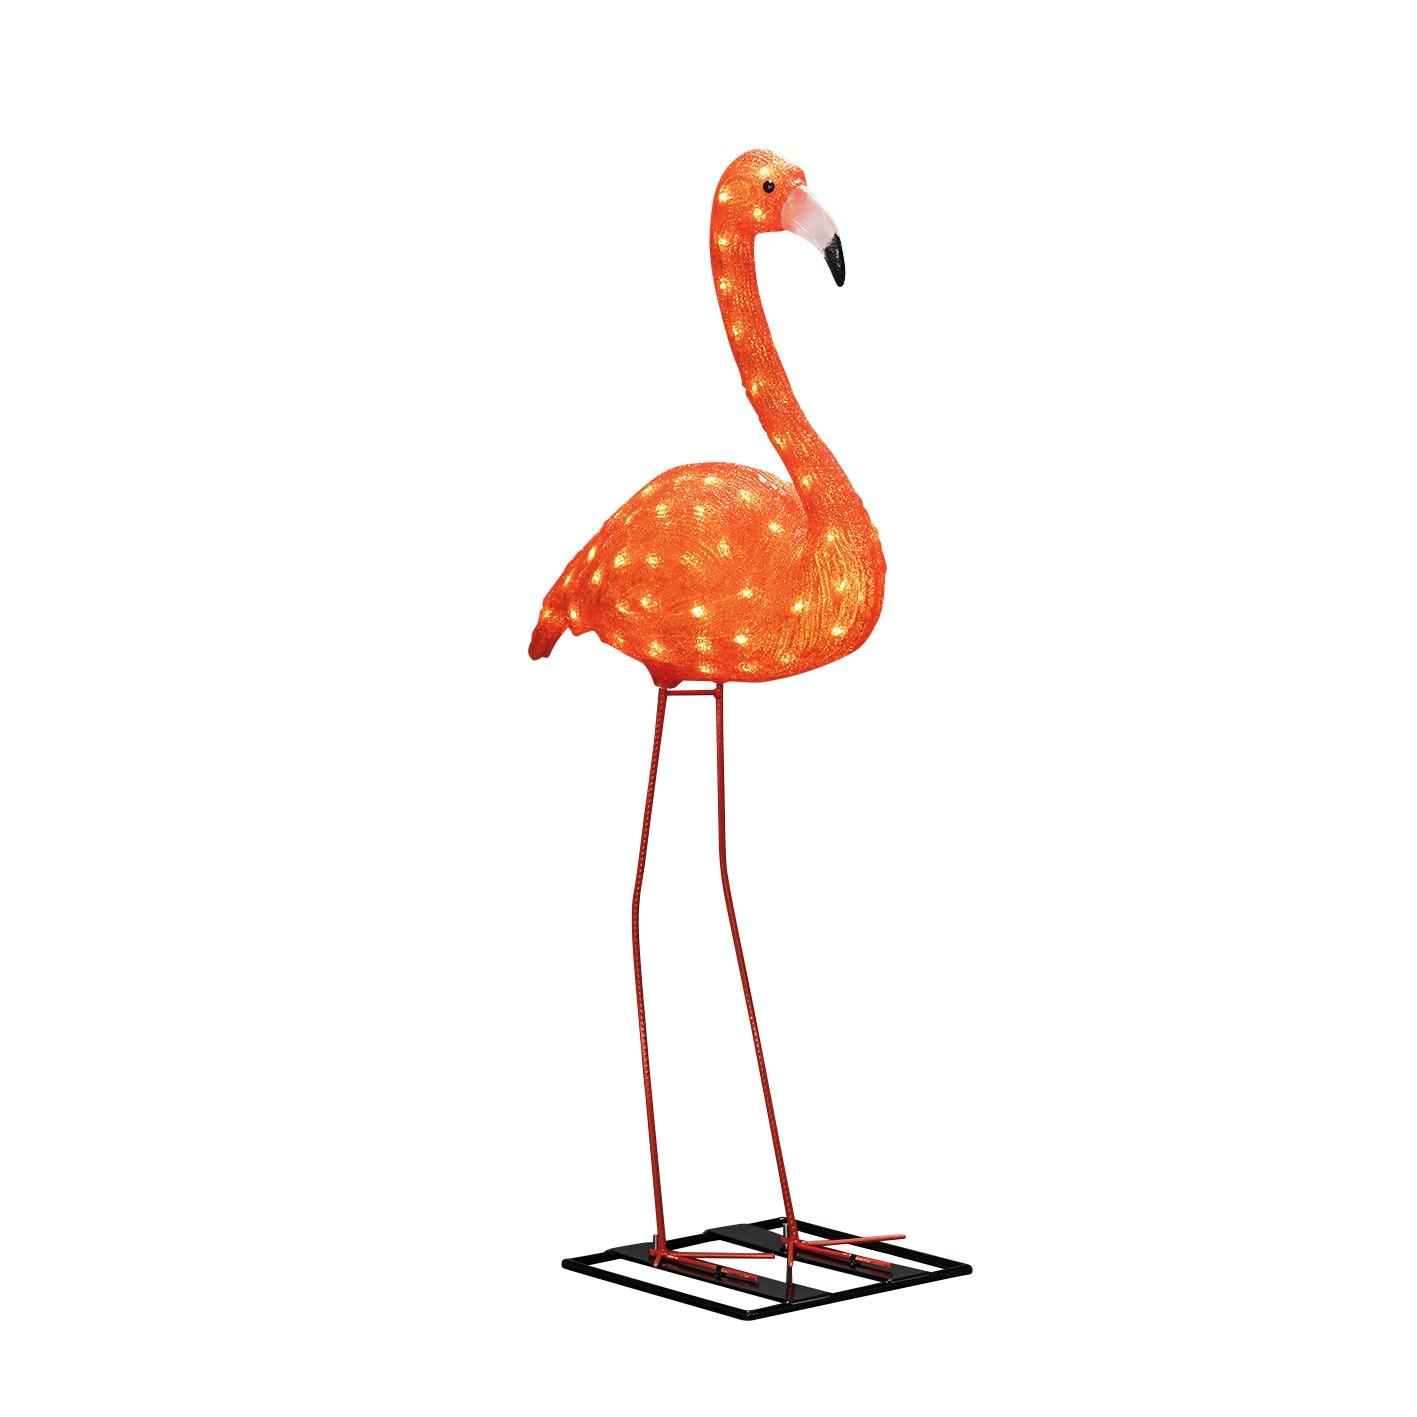 Trädgårdsbelysning Konstsmide Flamingo 110cm